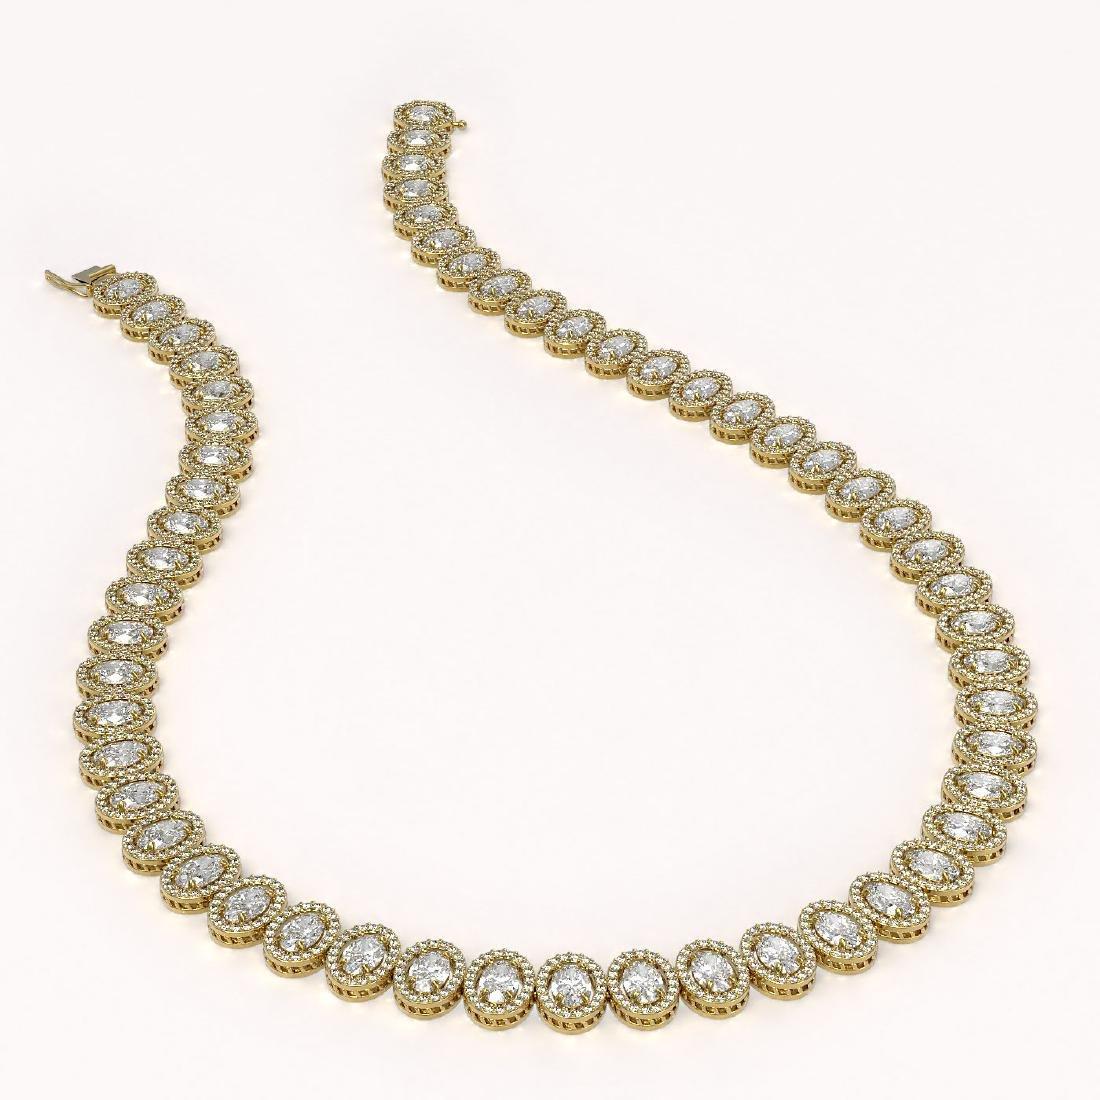 42.56 CTW Oval Diamond Designer Necklace 18K Yellow - 2